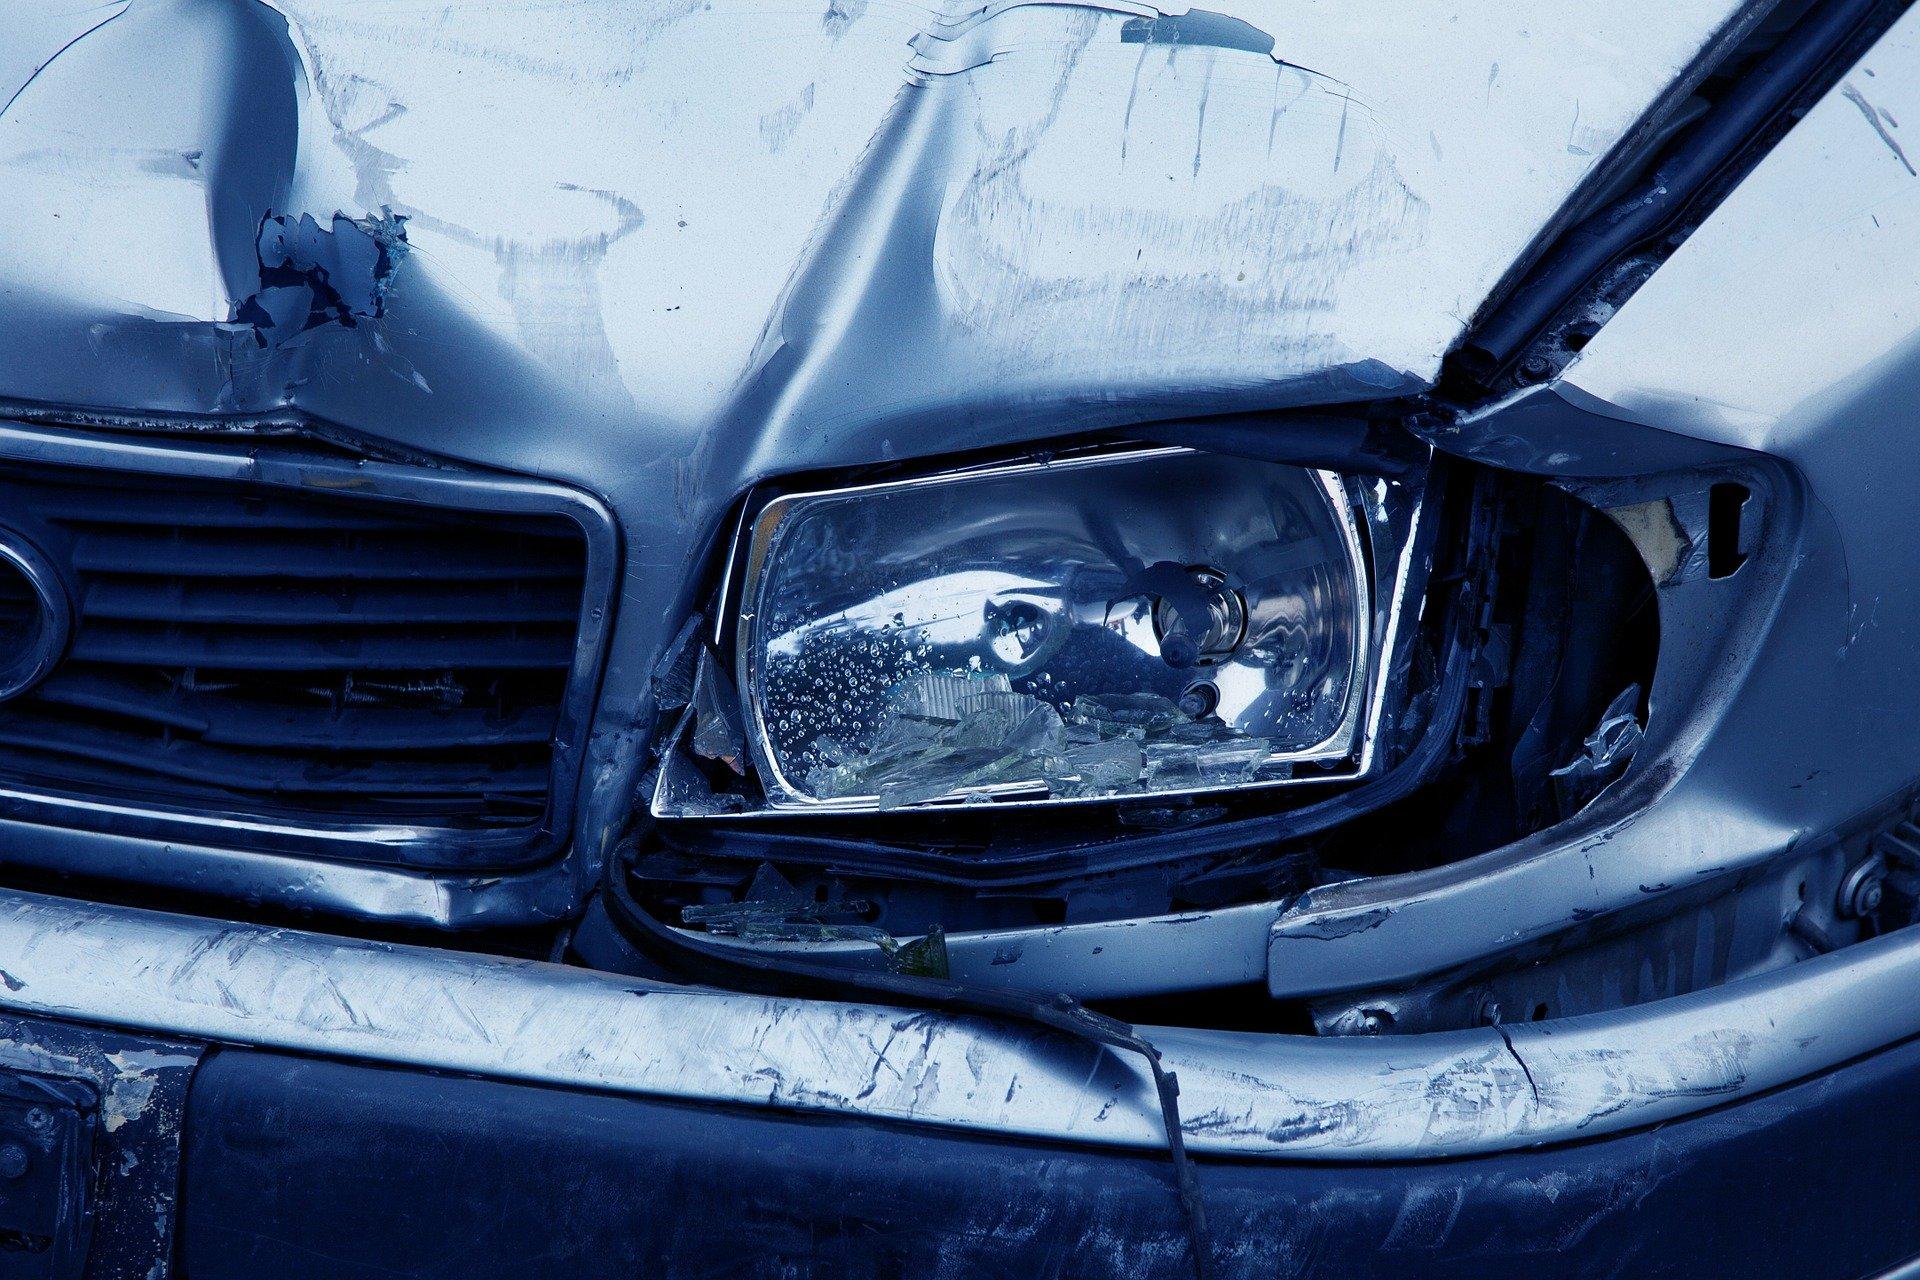 damaged car after collision